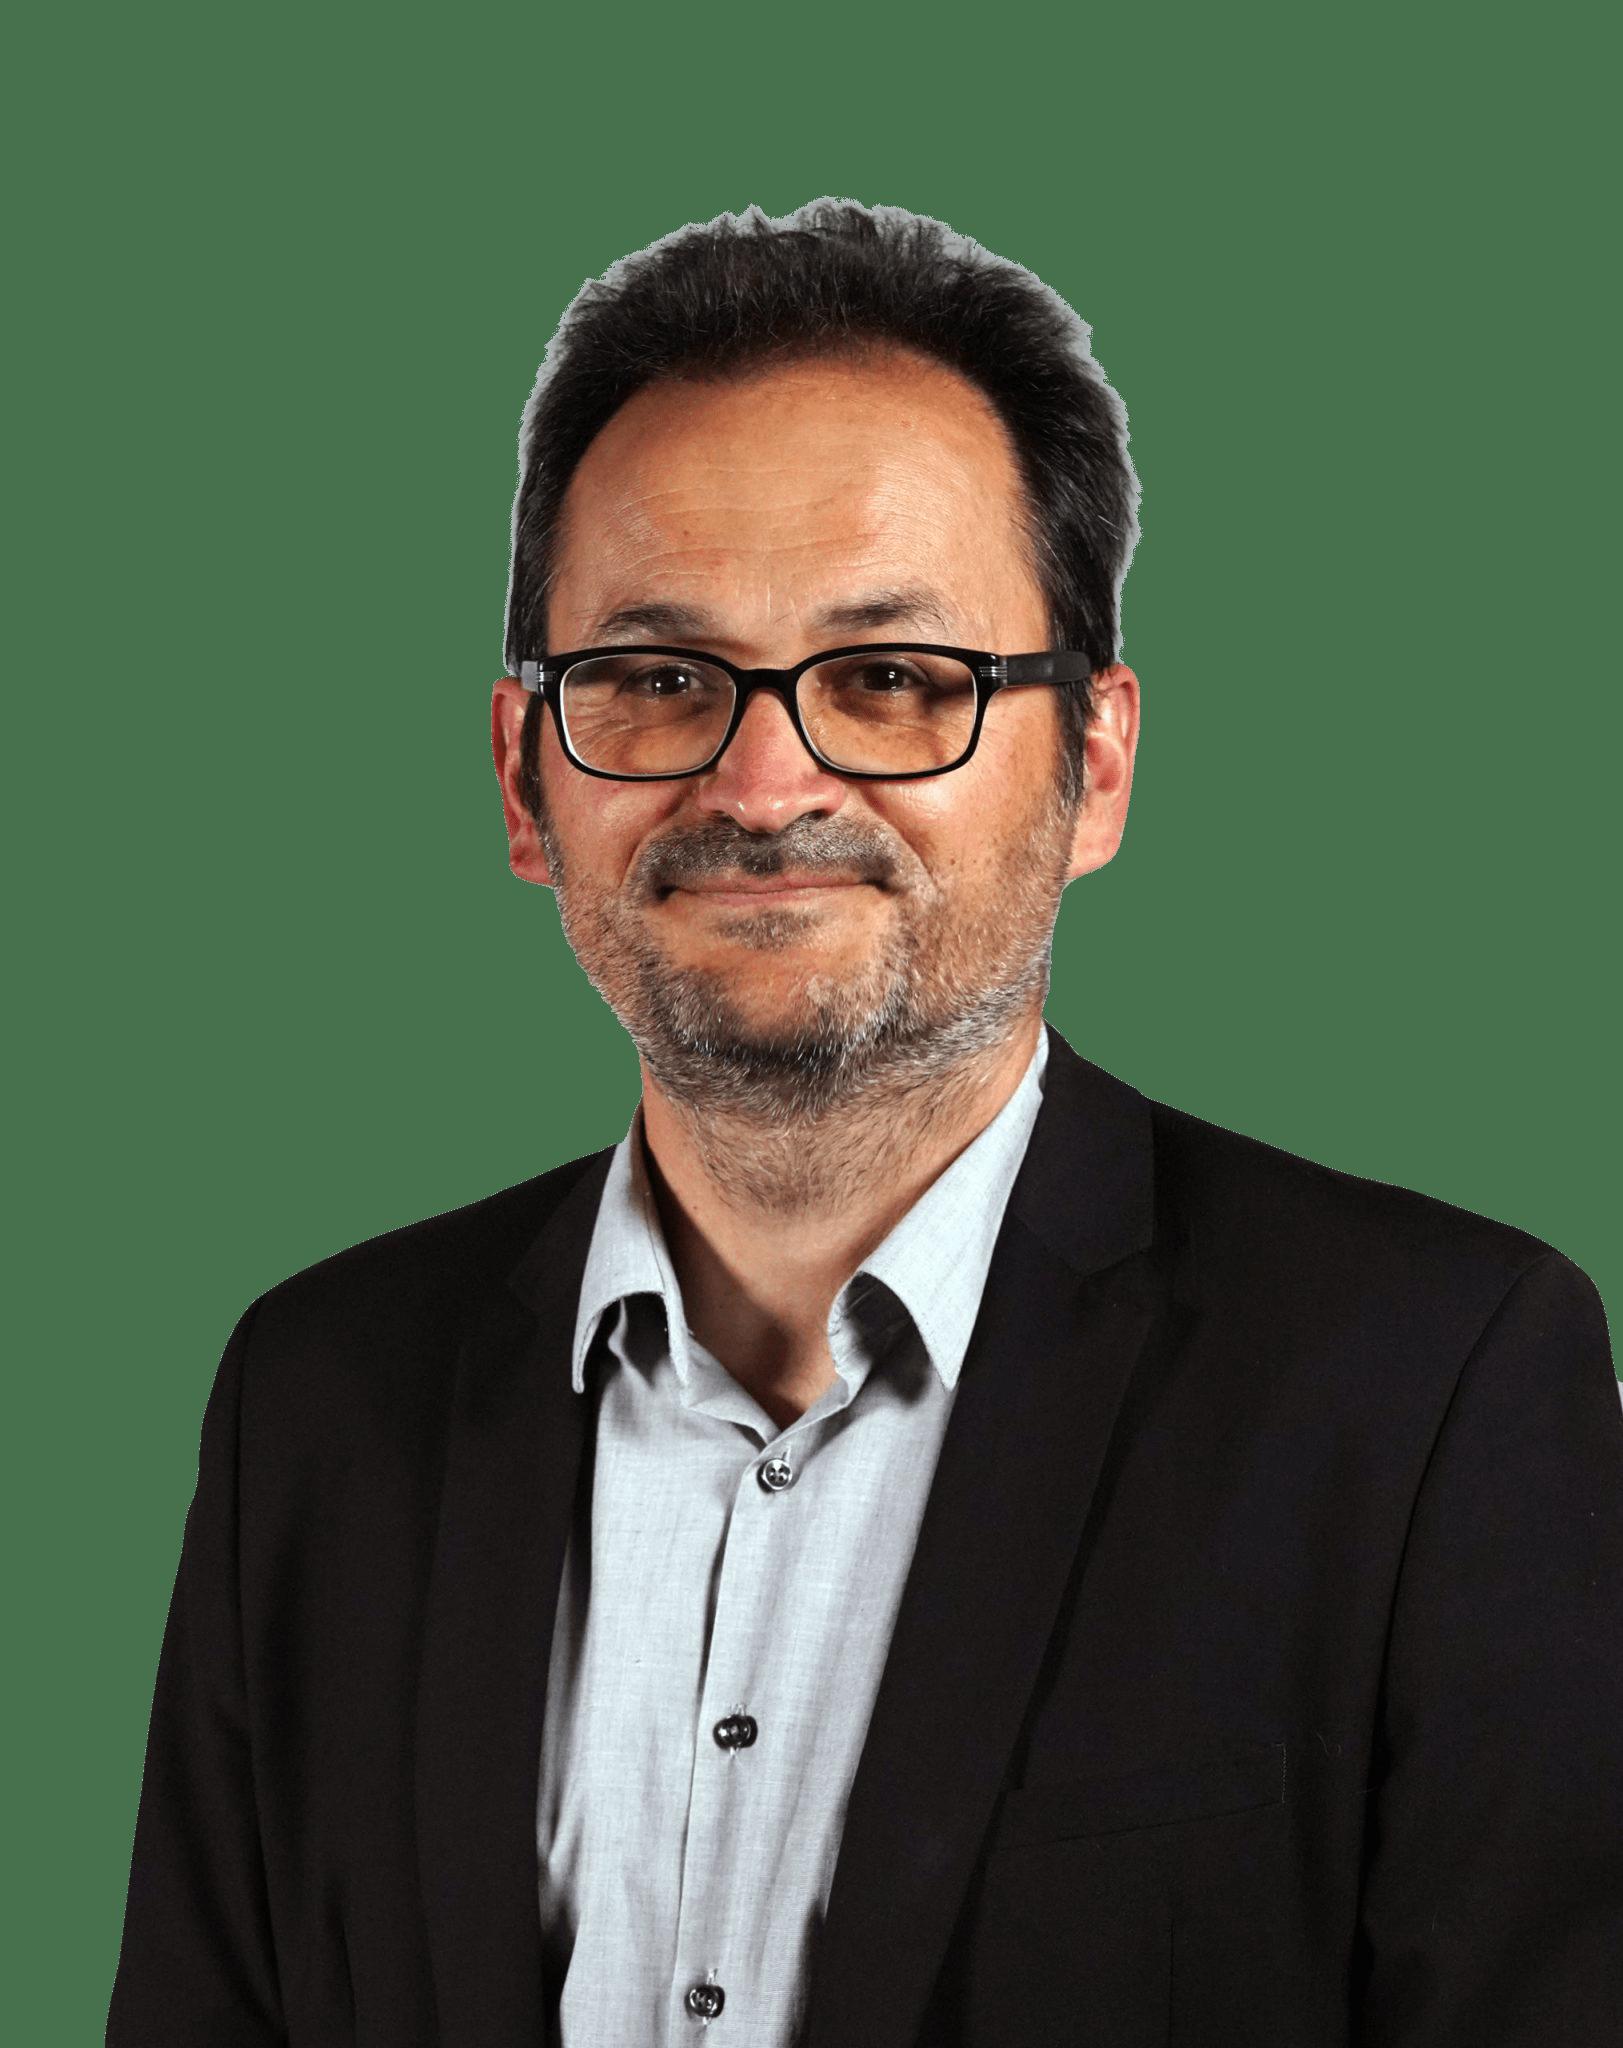 Didier Chapellon